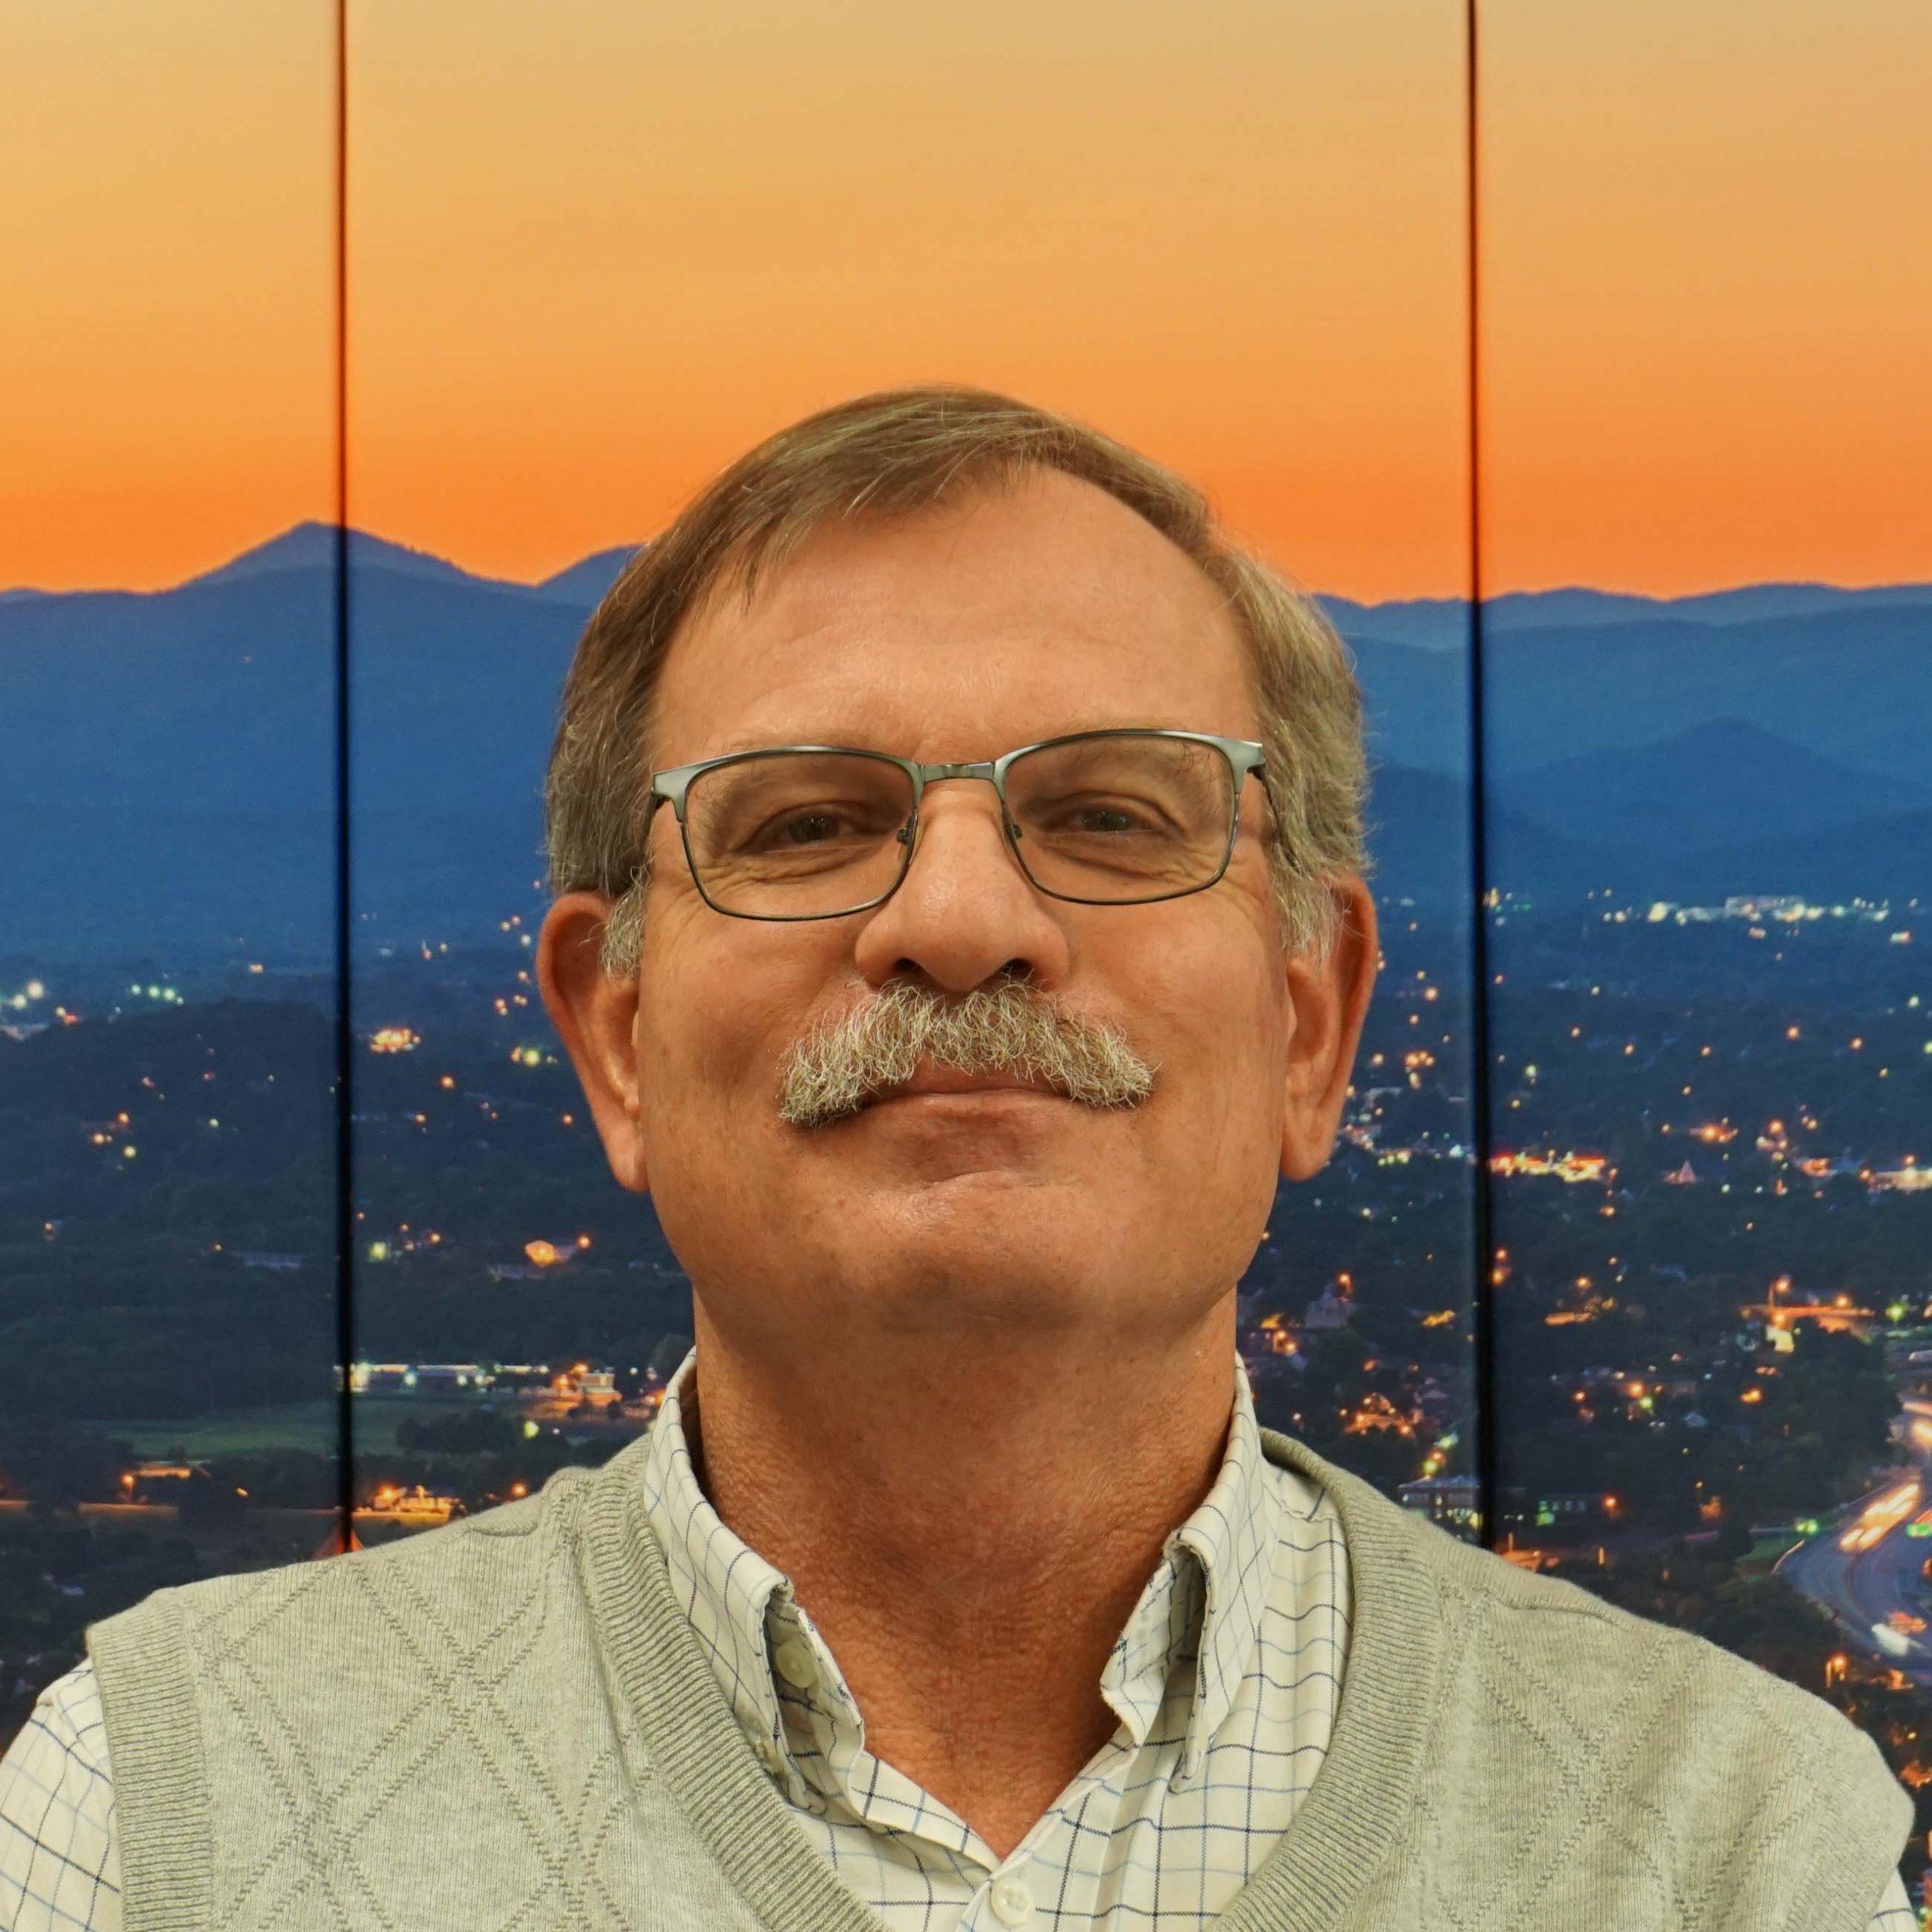 Joel Shank